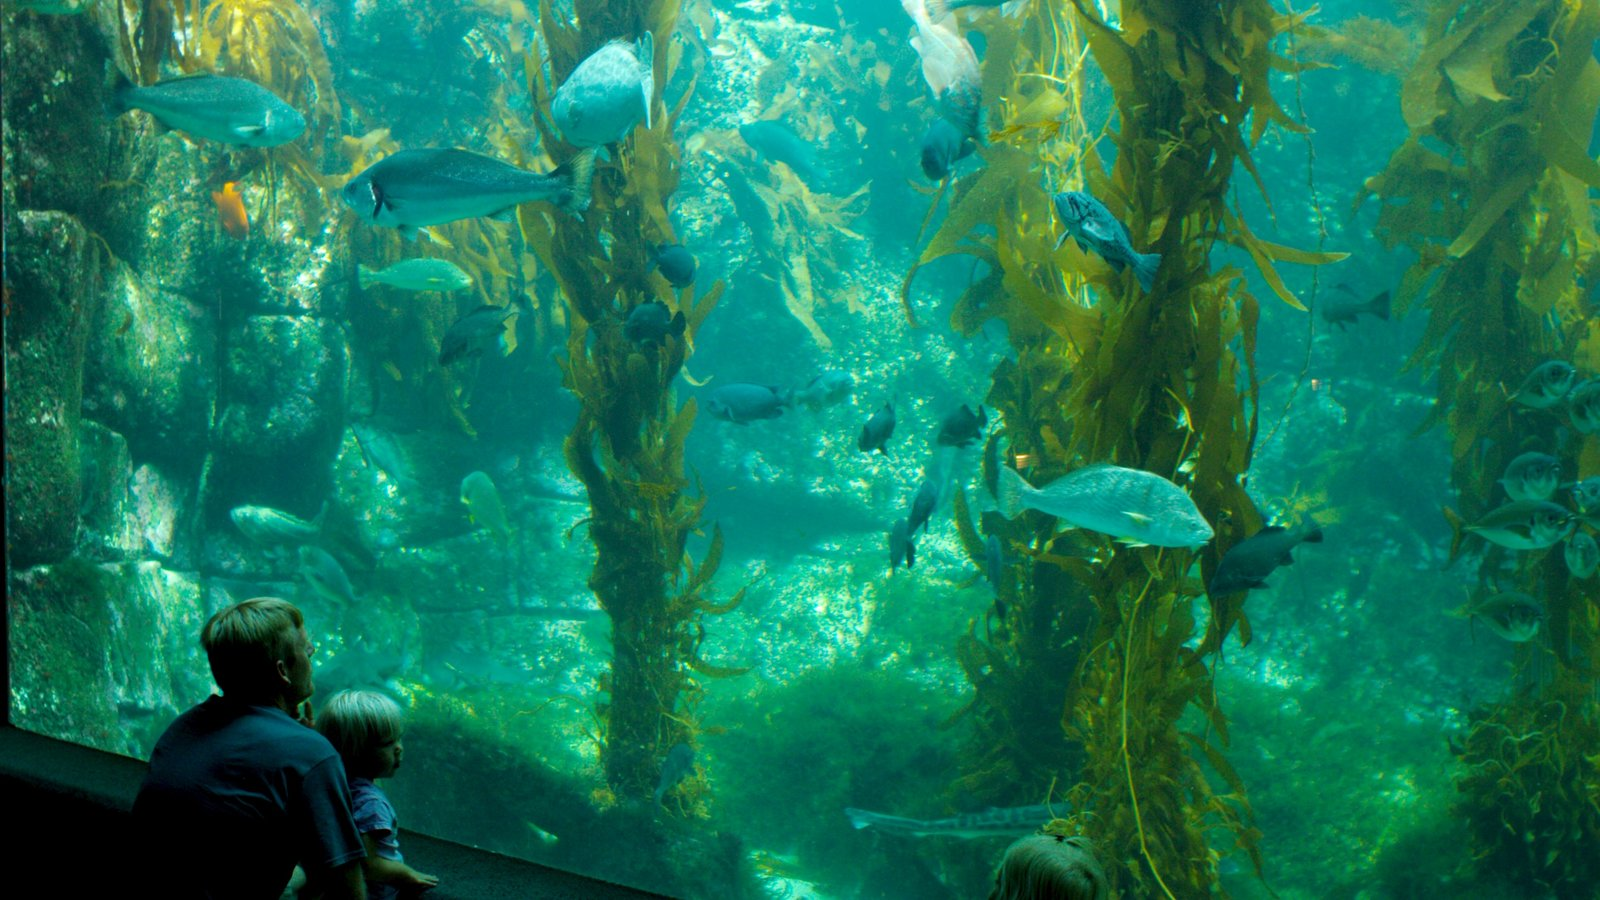 Birch Aquarium showing marine life and interior views